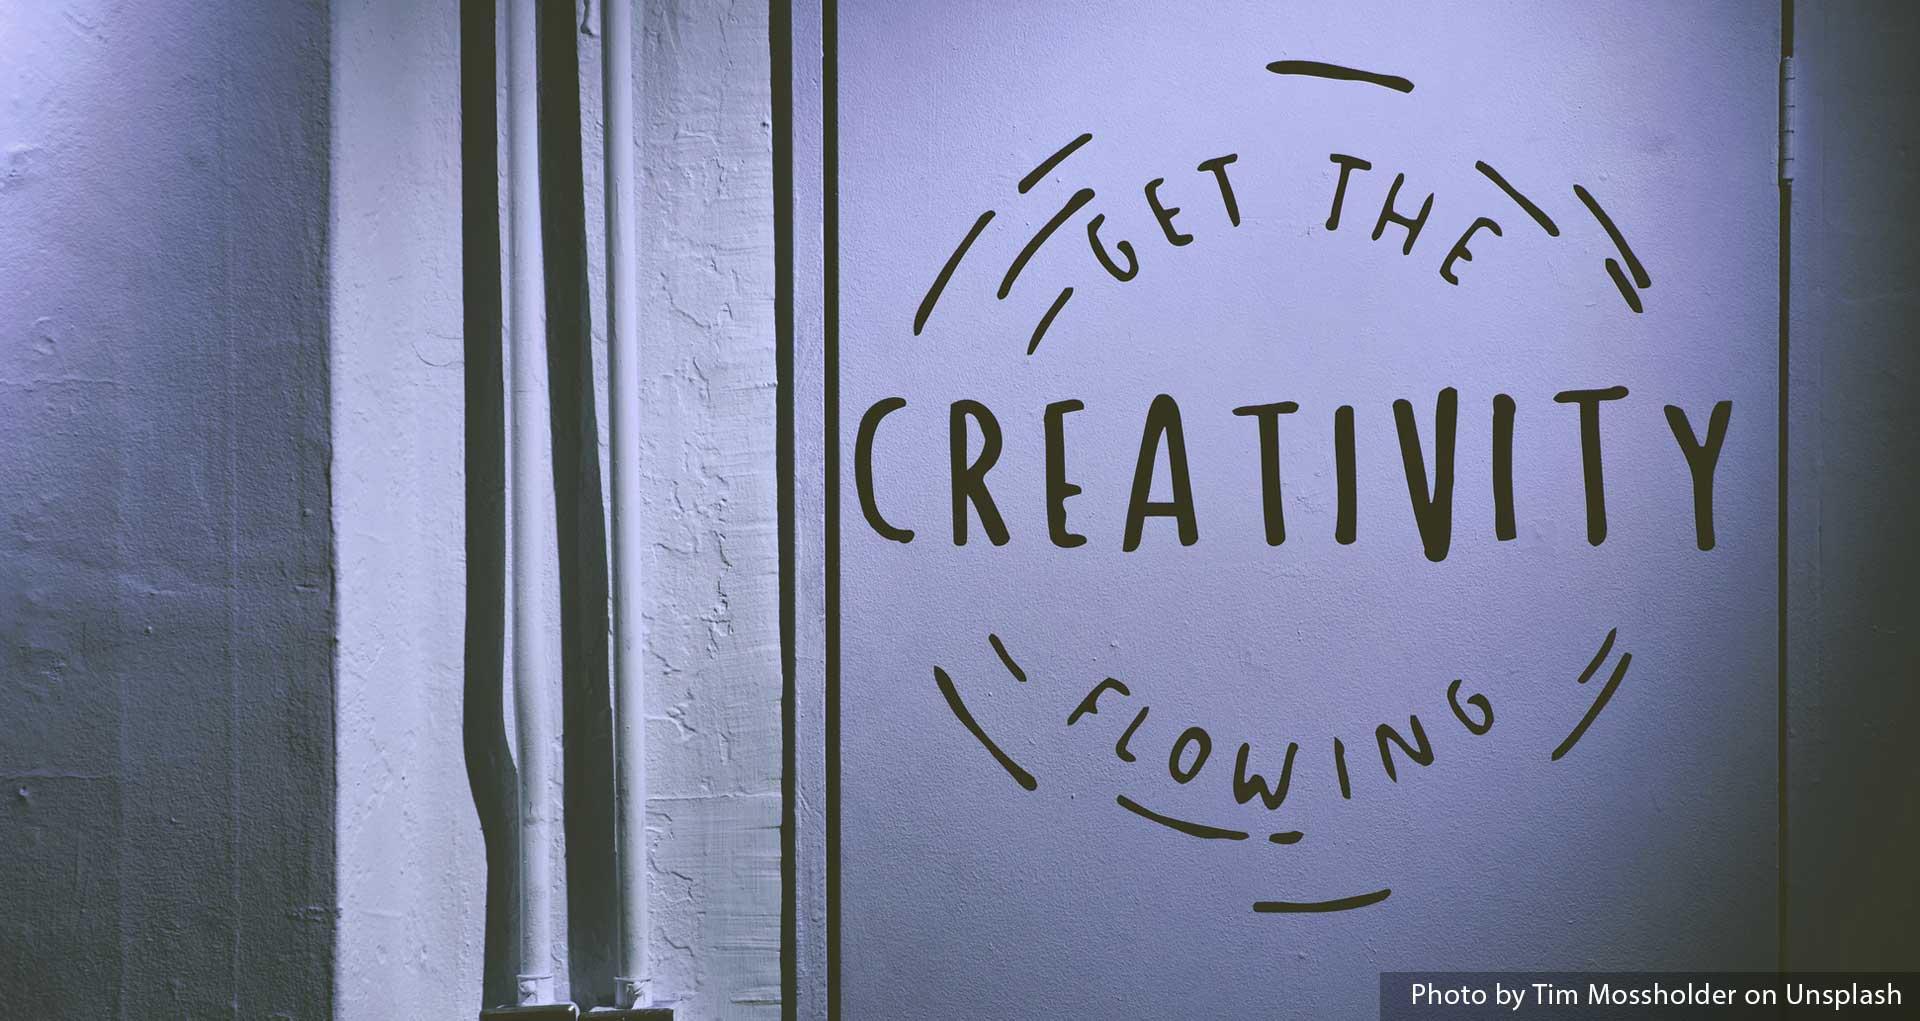 Process of Creativity in Entrepreneurship